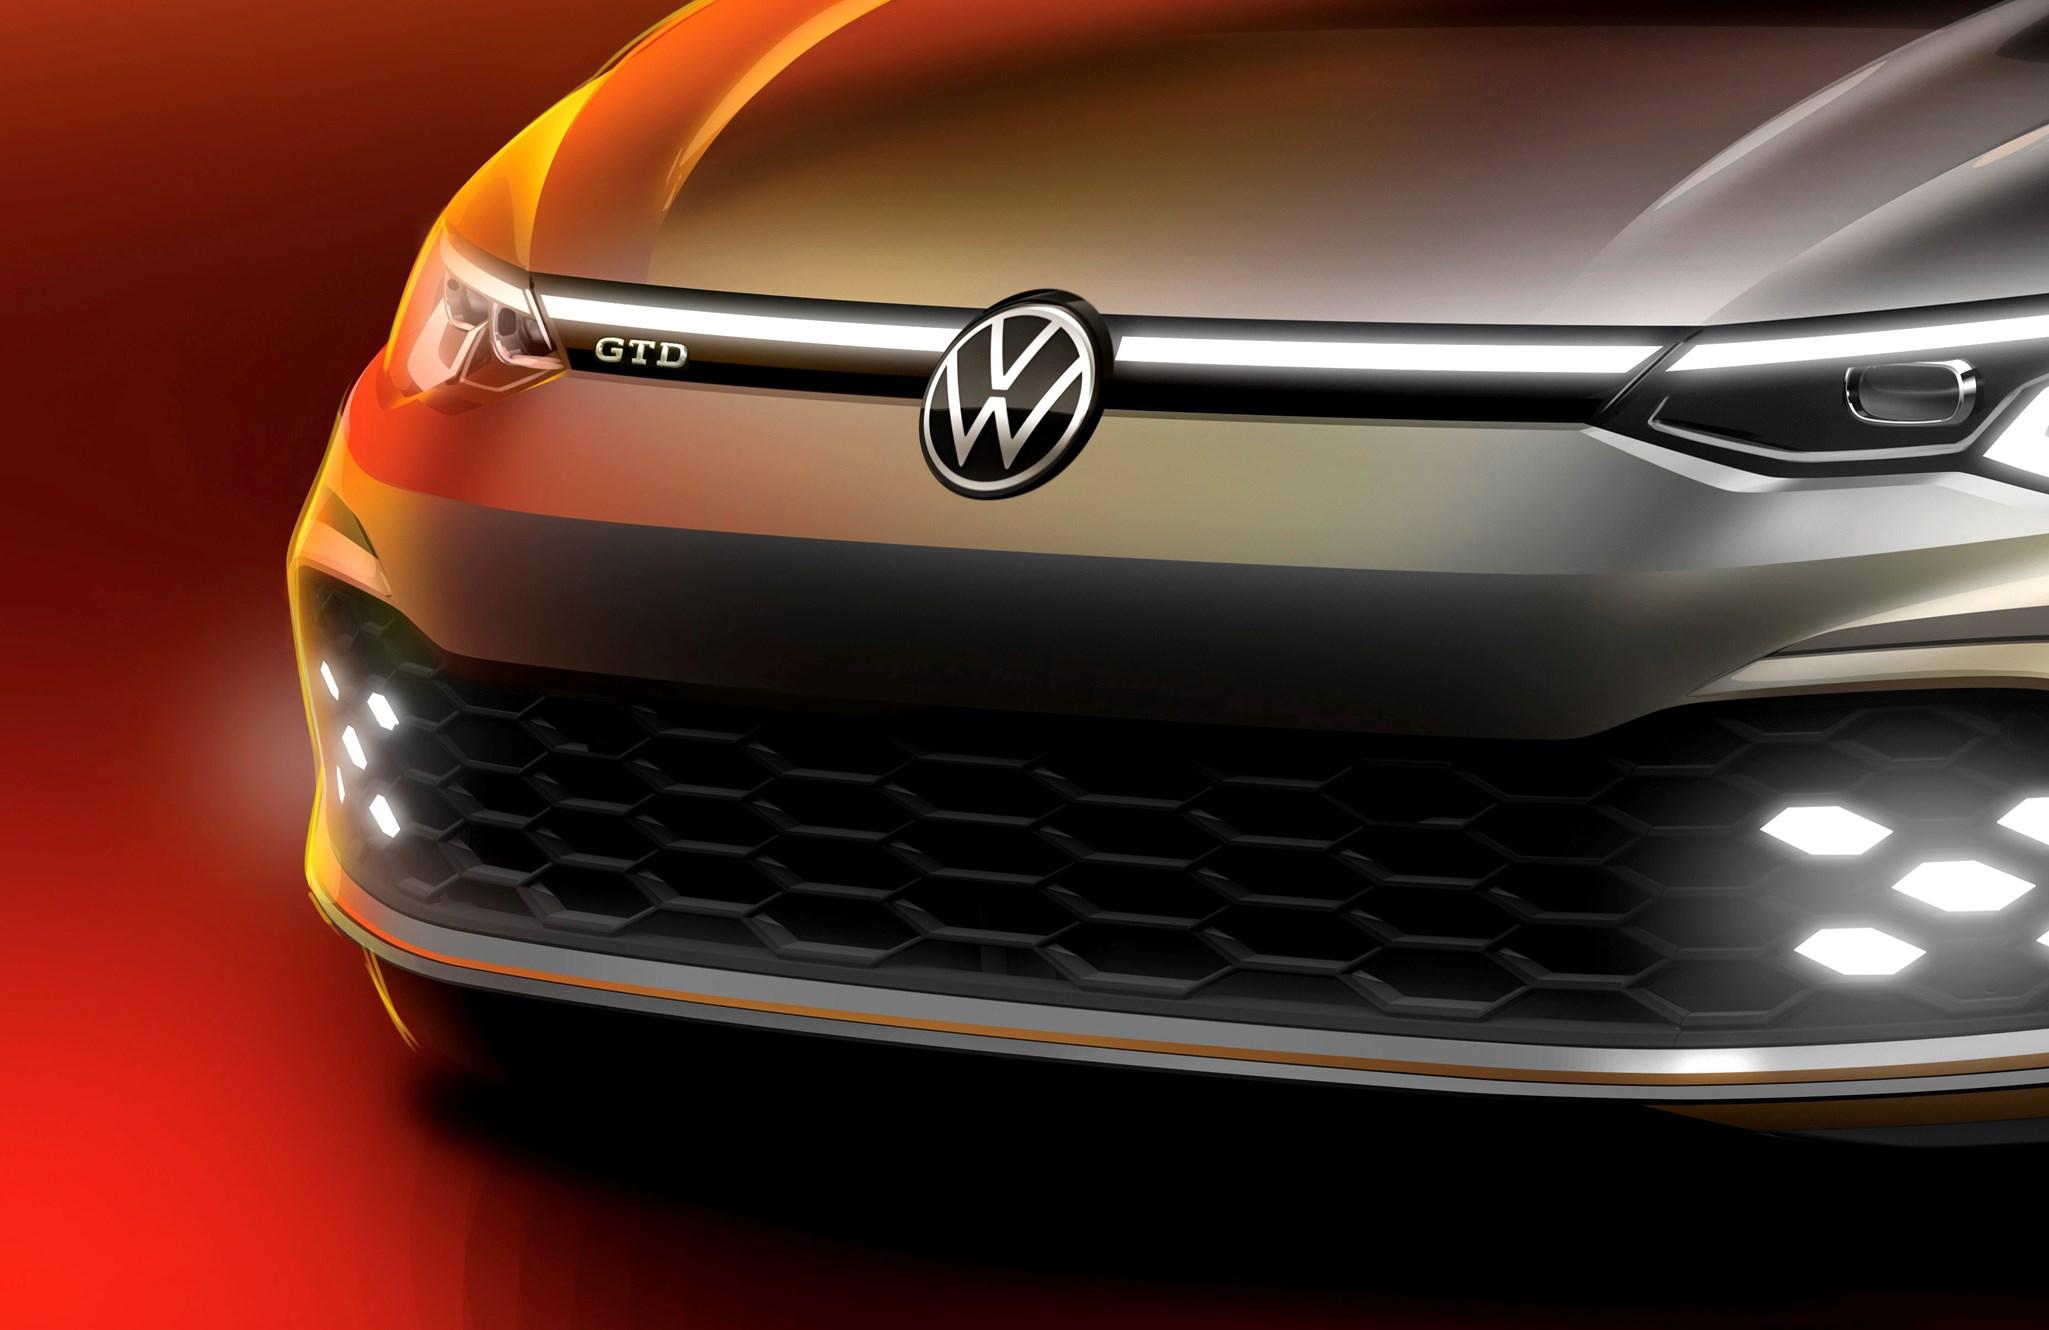 New VW Golf GTD bound for Geneva show